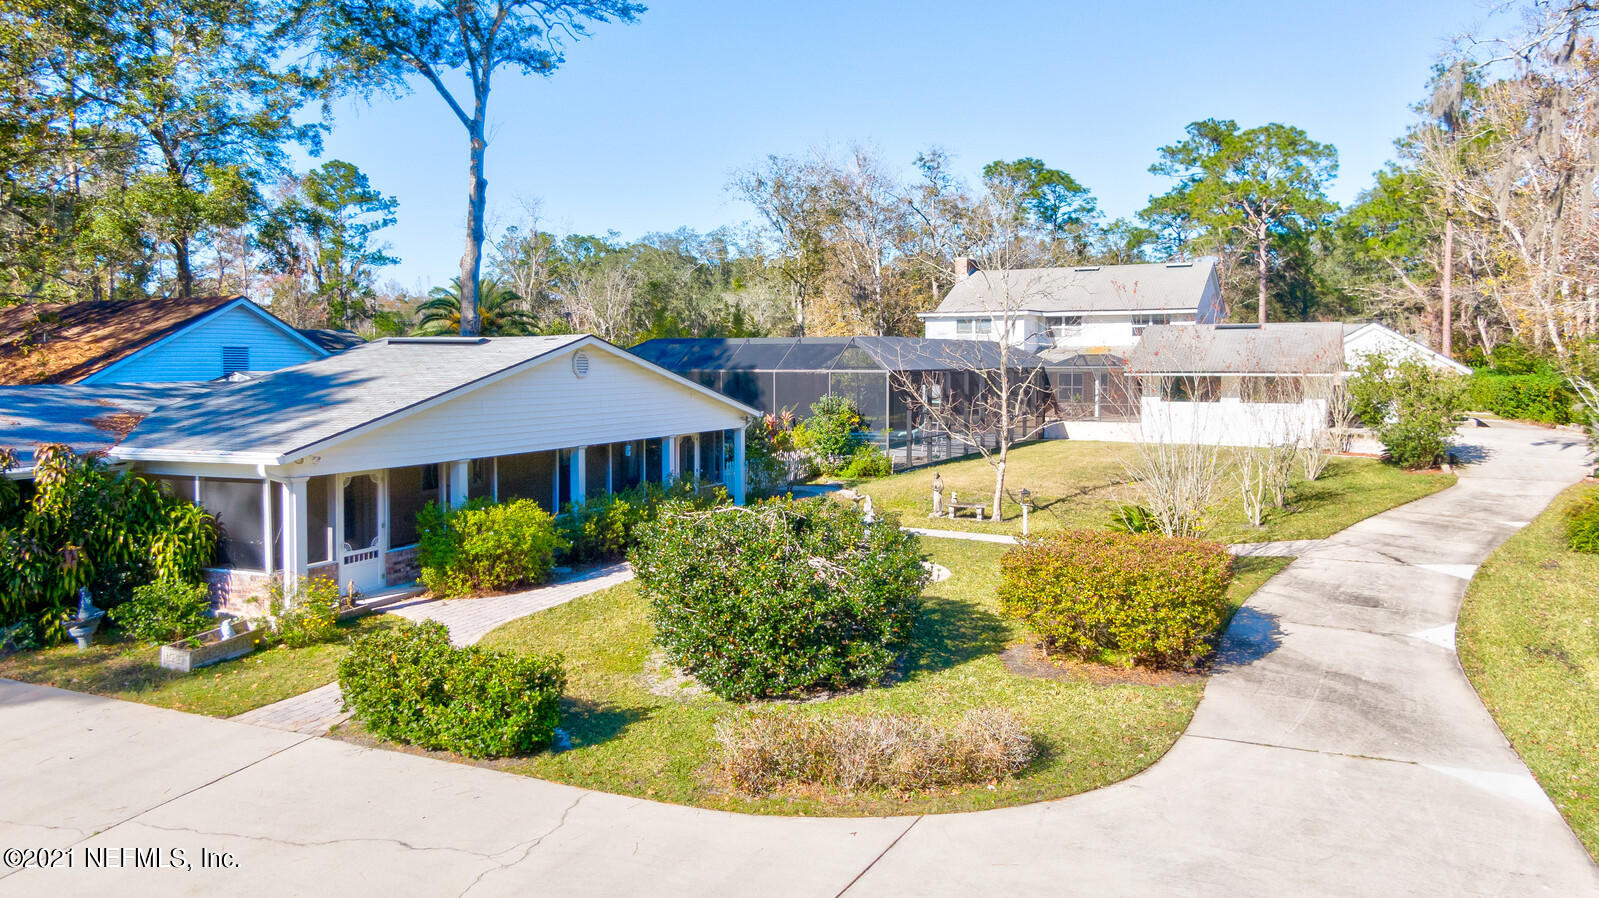 4734 JULINGTON CREEK, JACKSONVILLE, FLORIDA 32258, 7 Bedrooms Bedrooms, ,5 BathroomsBathrooms,Investment / MultiFamily,For sale,JULINGTON CREEK,1095843